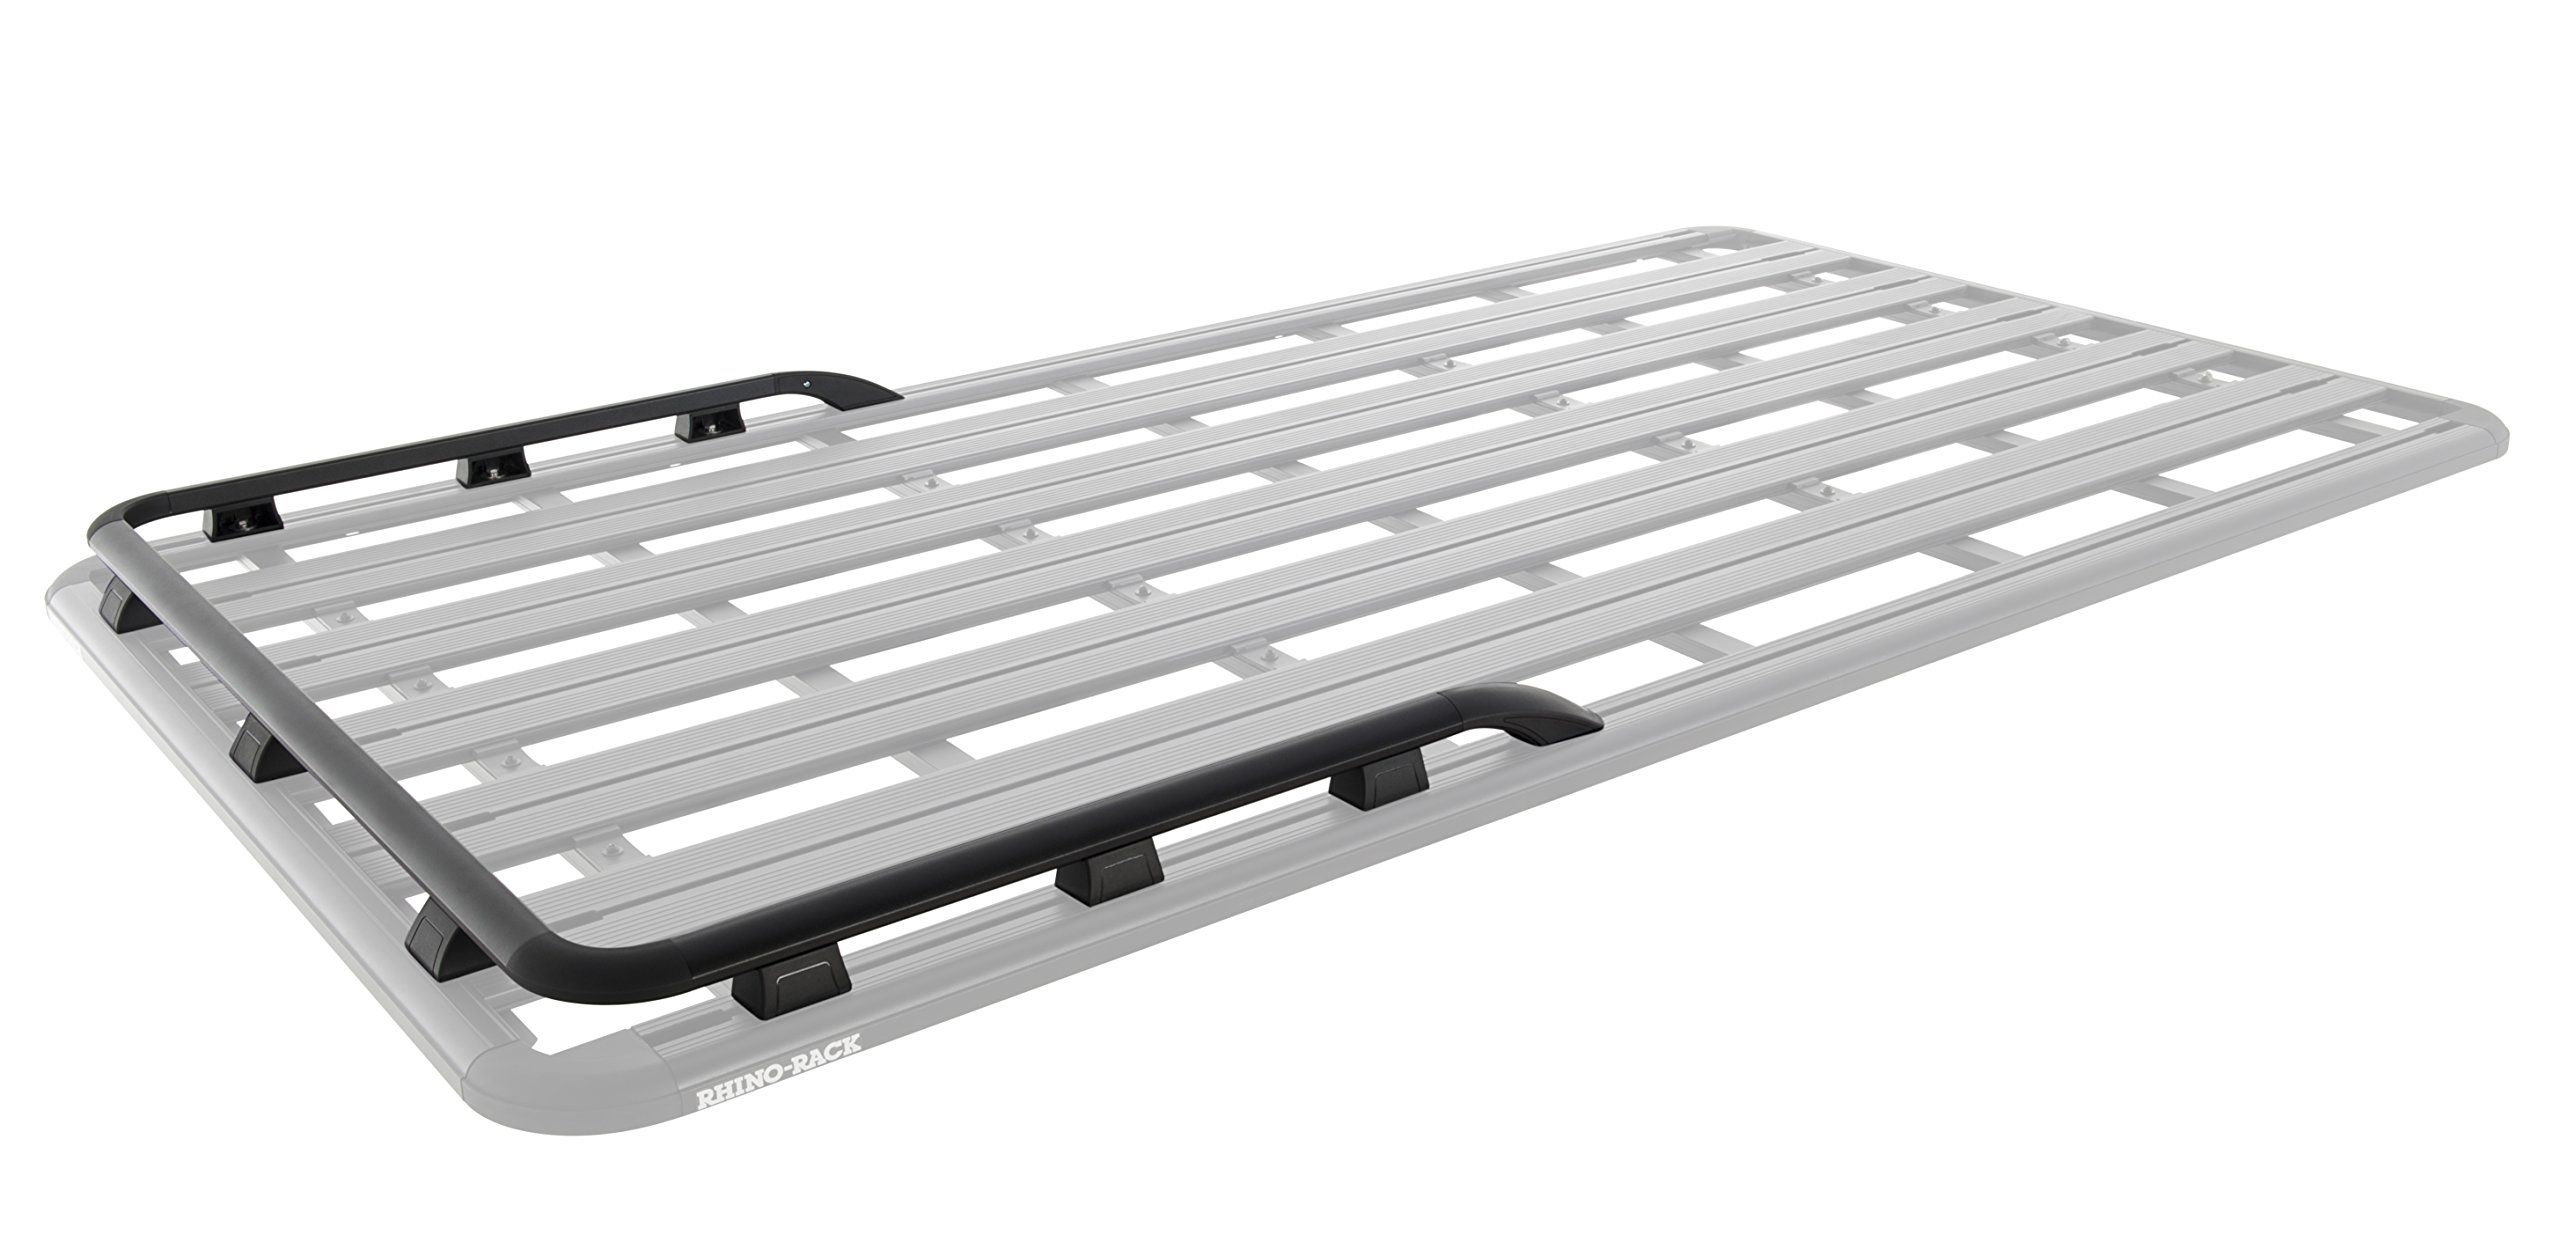 Rhino Rack 43161b Pioneer Platform Front Side Rails For Suit 42105b Car Racks Rails Rack